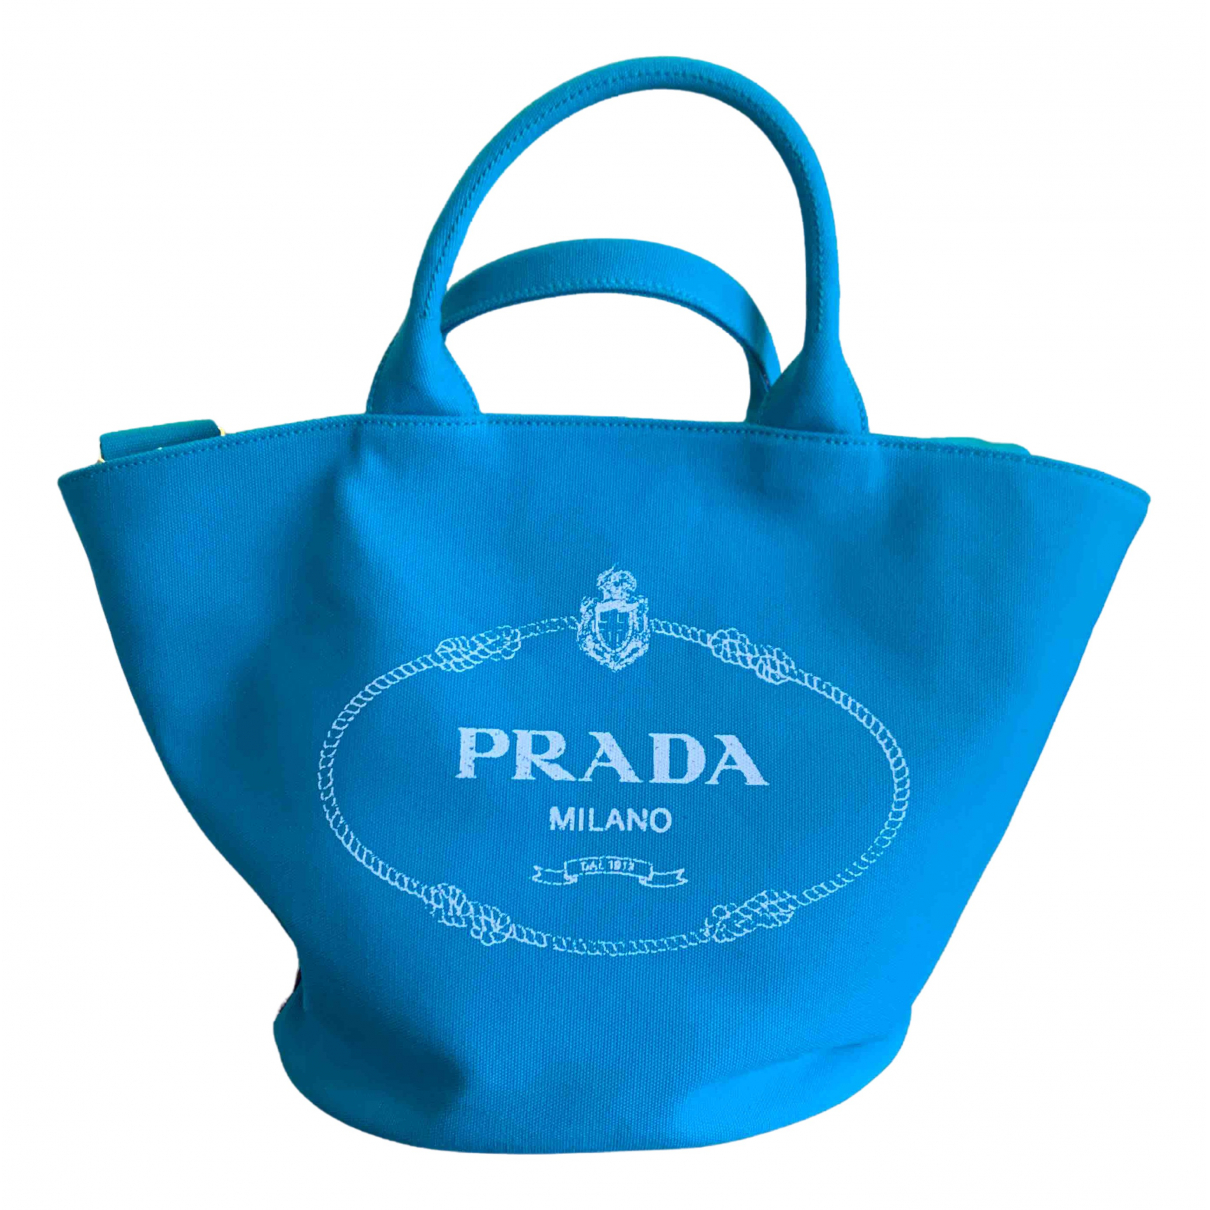 Prada - Sac a main   pour femme en toile - turquoise